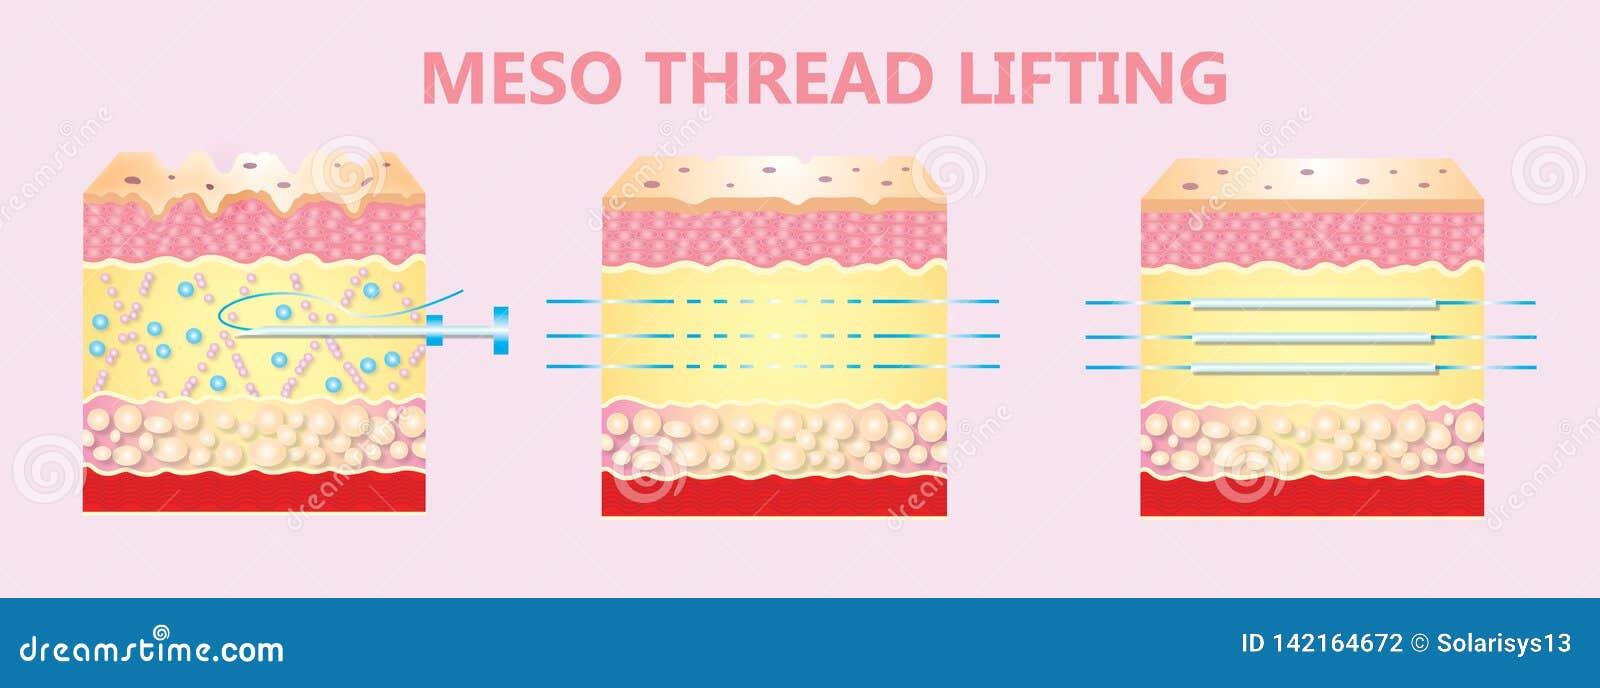 Illustration of meso threads lifting